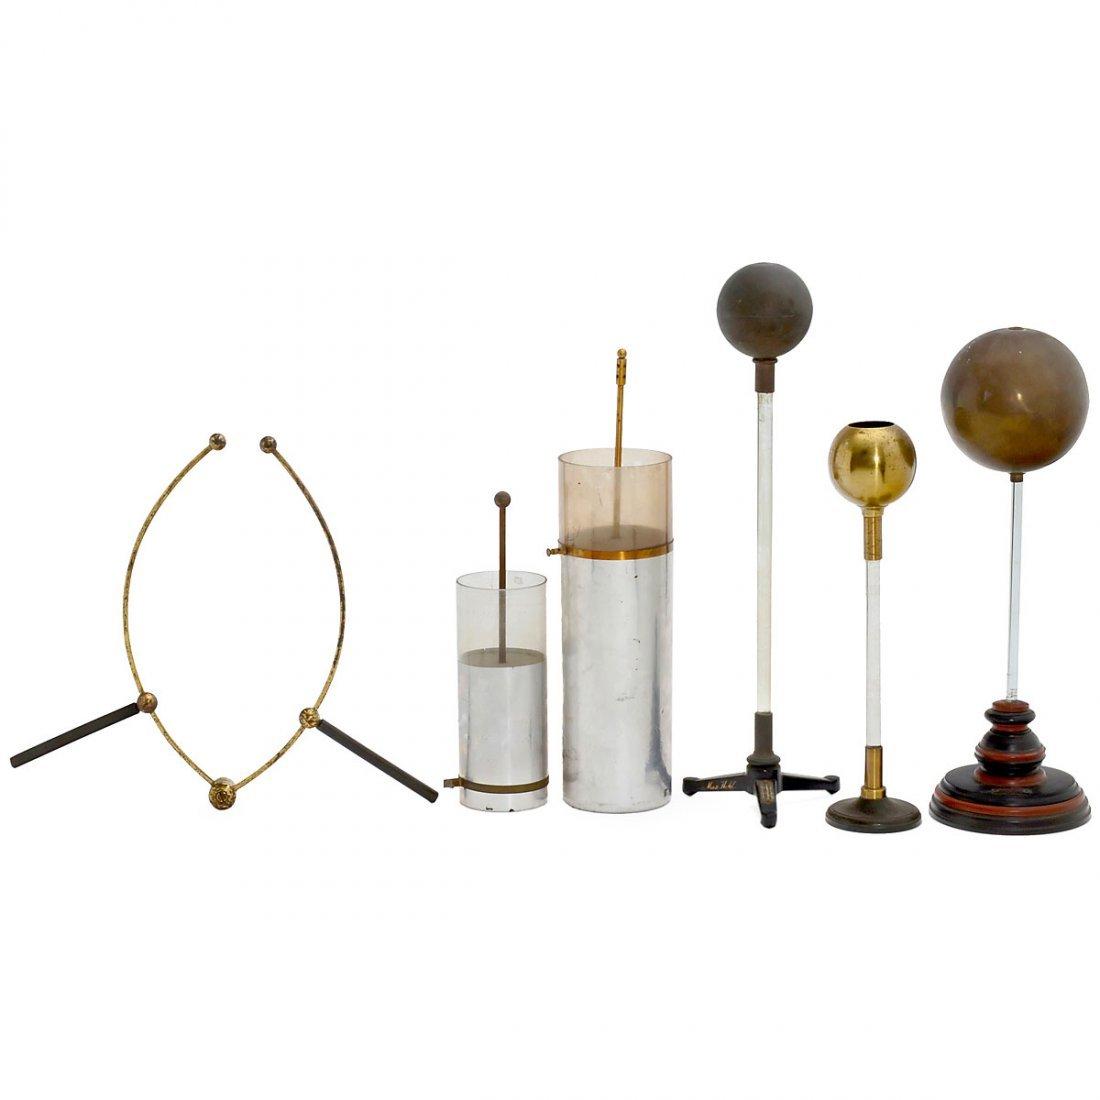 6 Physical Demonstration Models, c. 1910